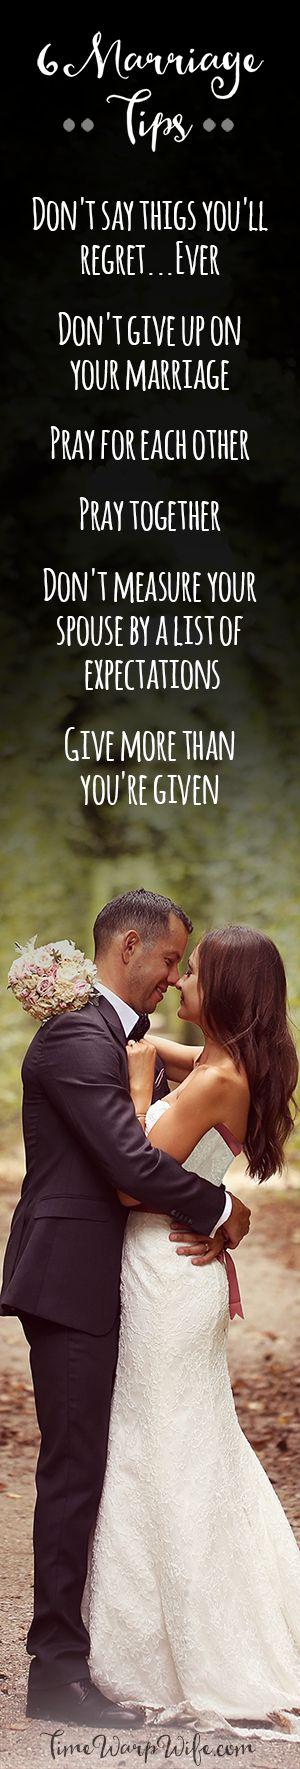 6 Marriage Tips https://twitter.com/NeilVenketramen